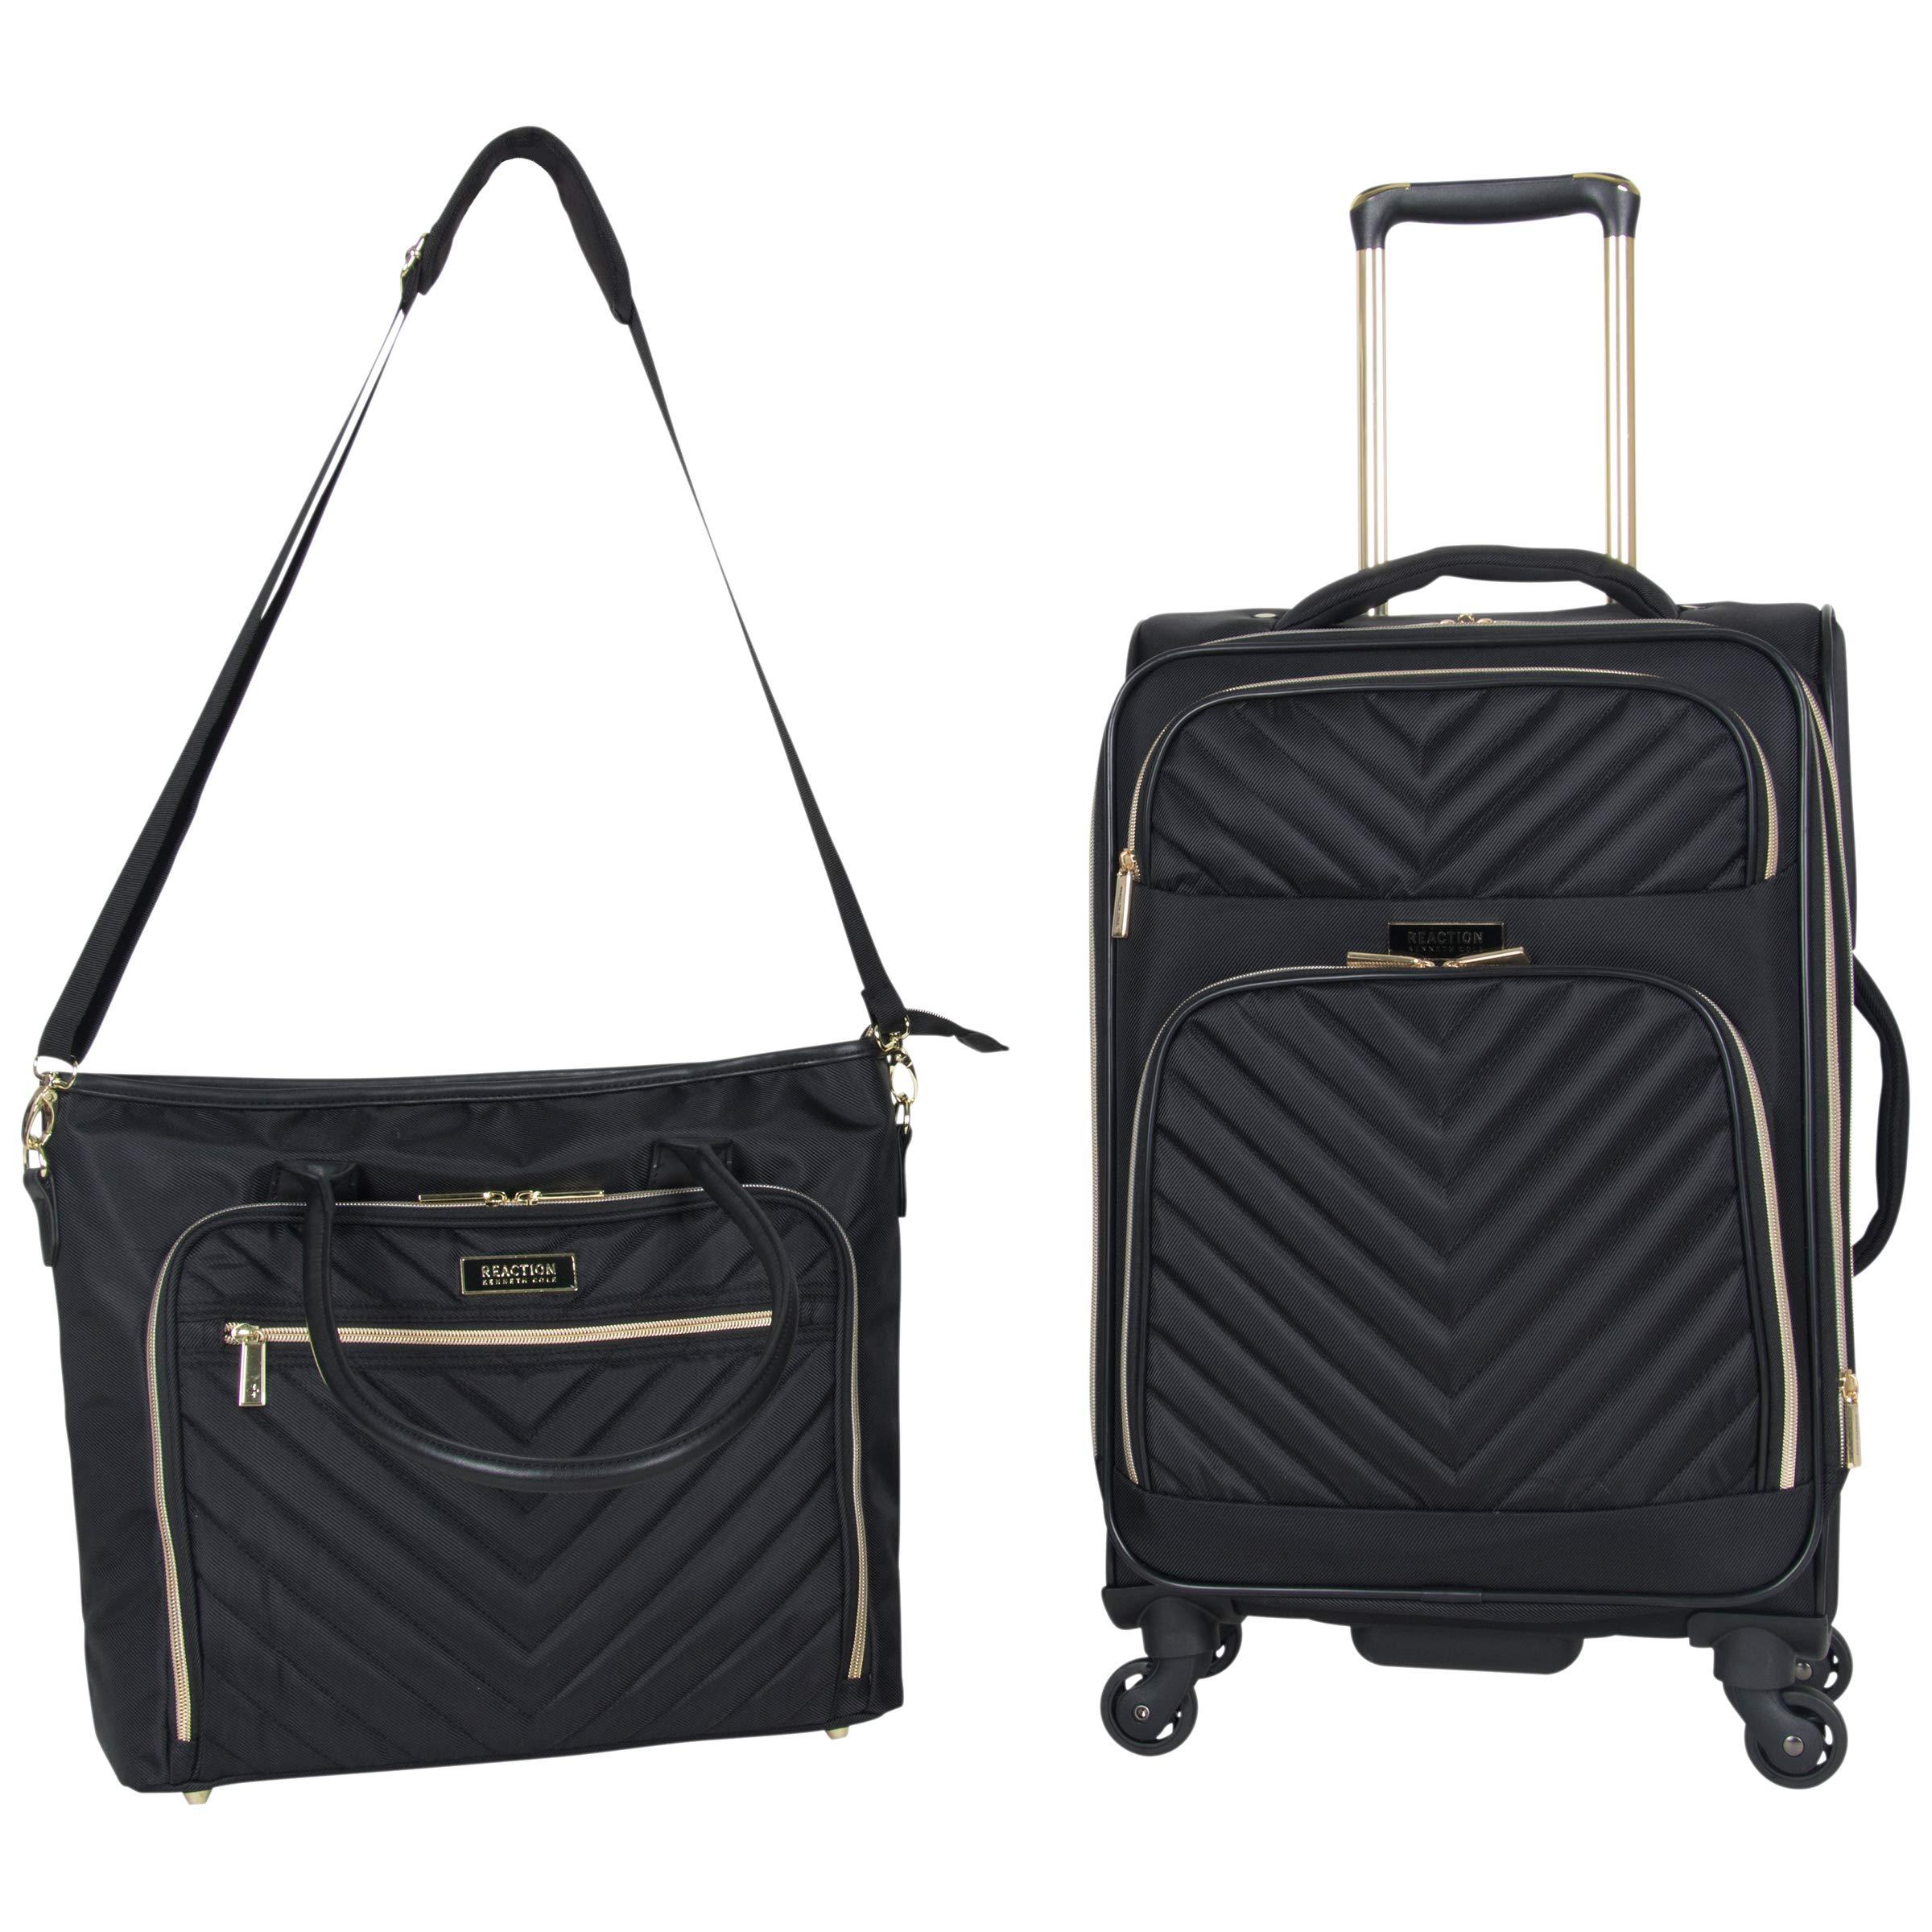 Kenneth Cole Reaction Expandable Suitcase